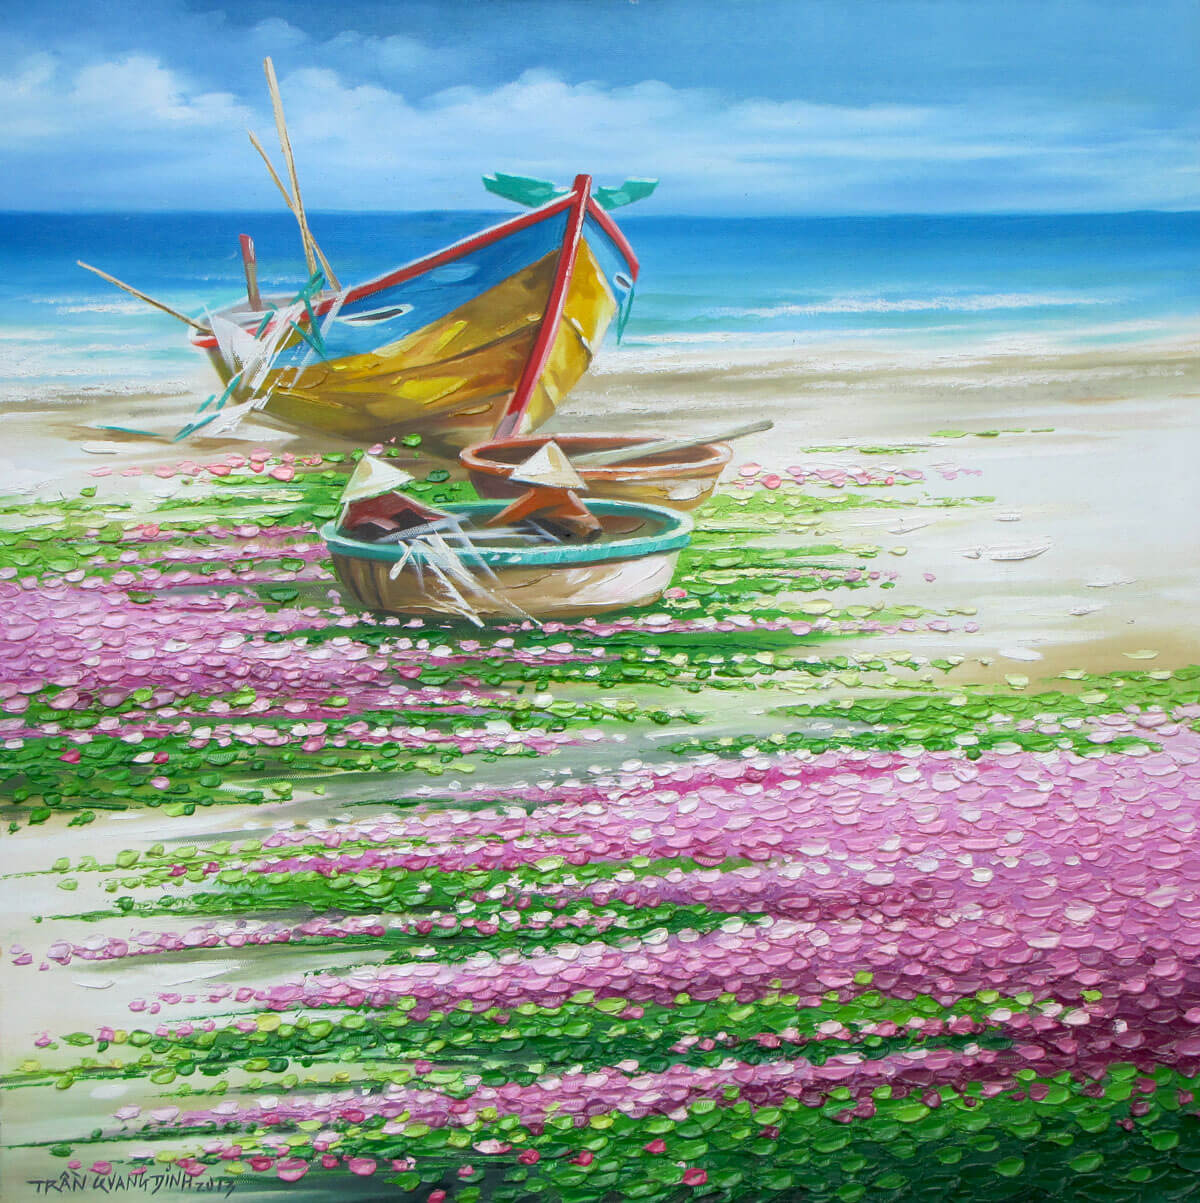 Water-morning glory 4-Original Asian Art